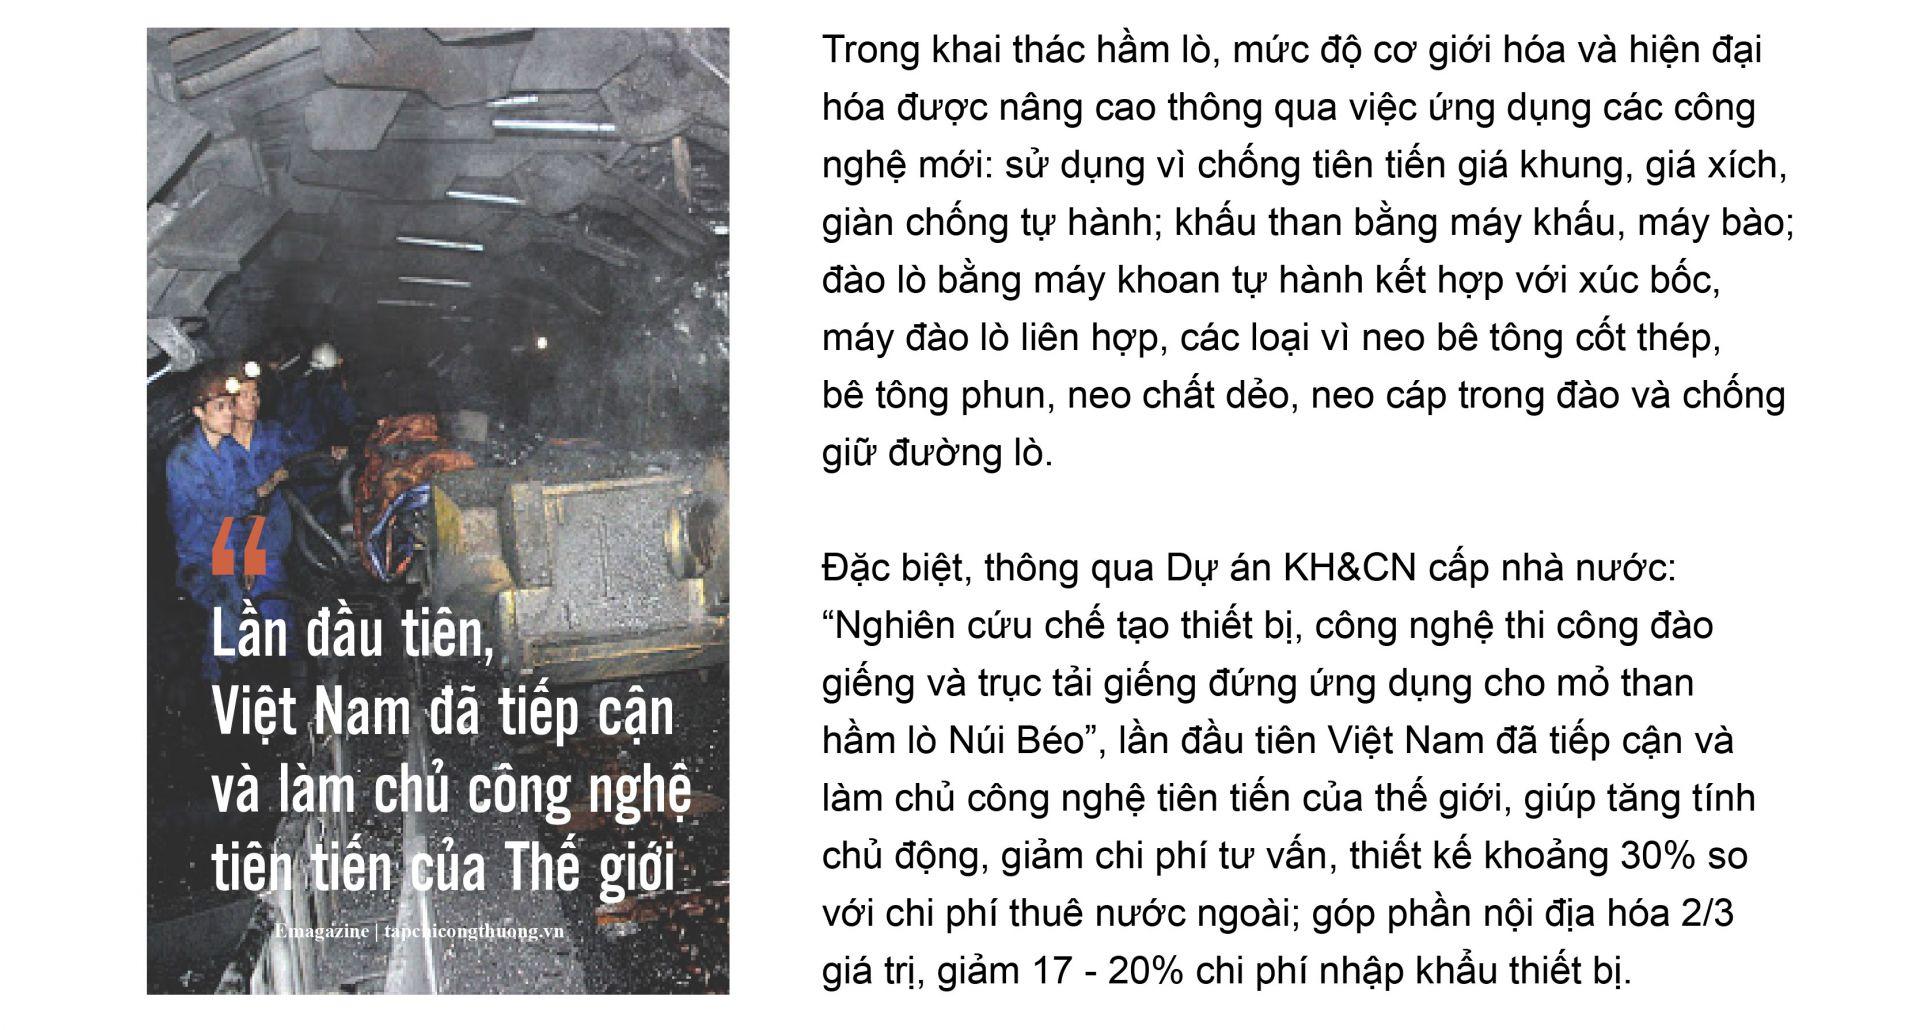 emagazine thanh tuu noi bat nganh khoa hoc cong nghe va dinh huong phat trien cua nganh cong thuong